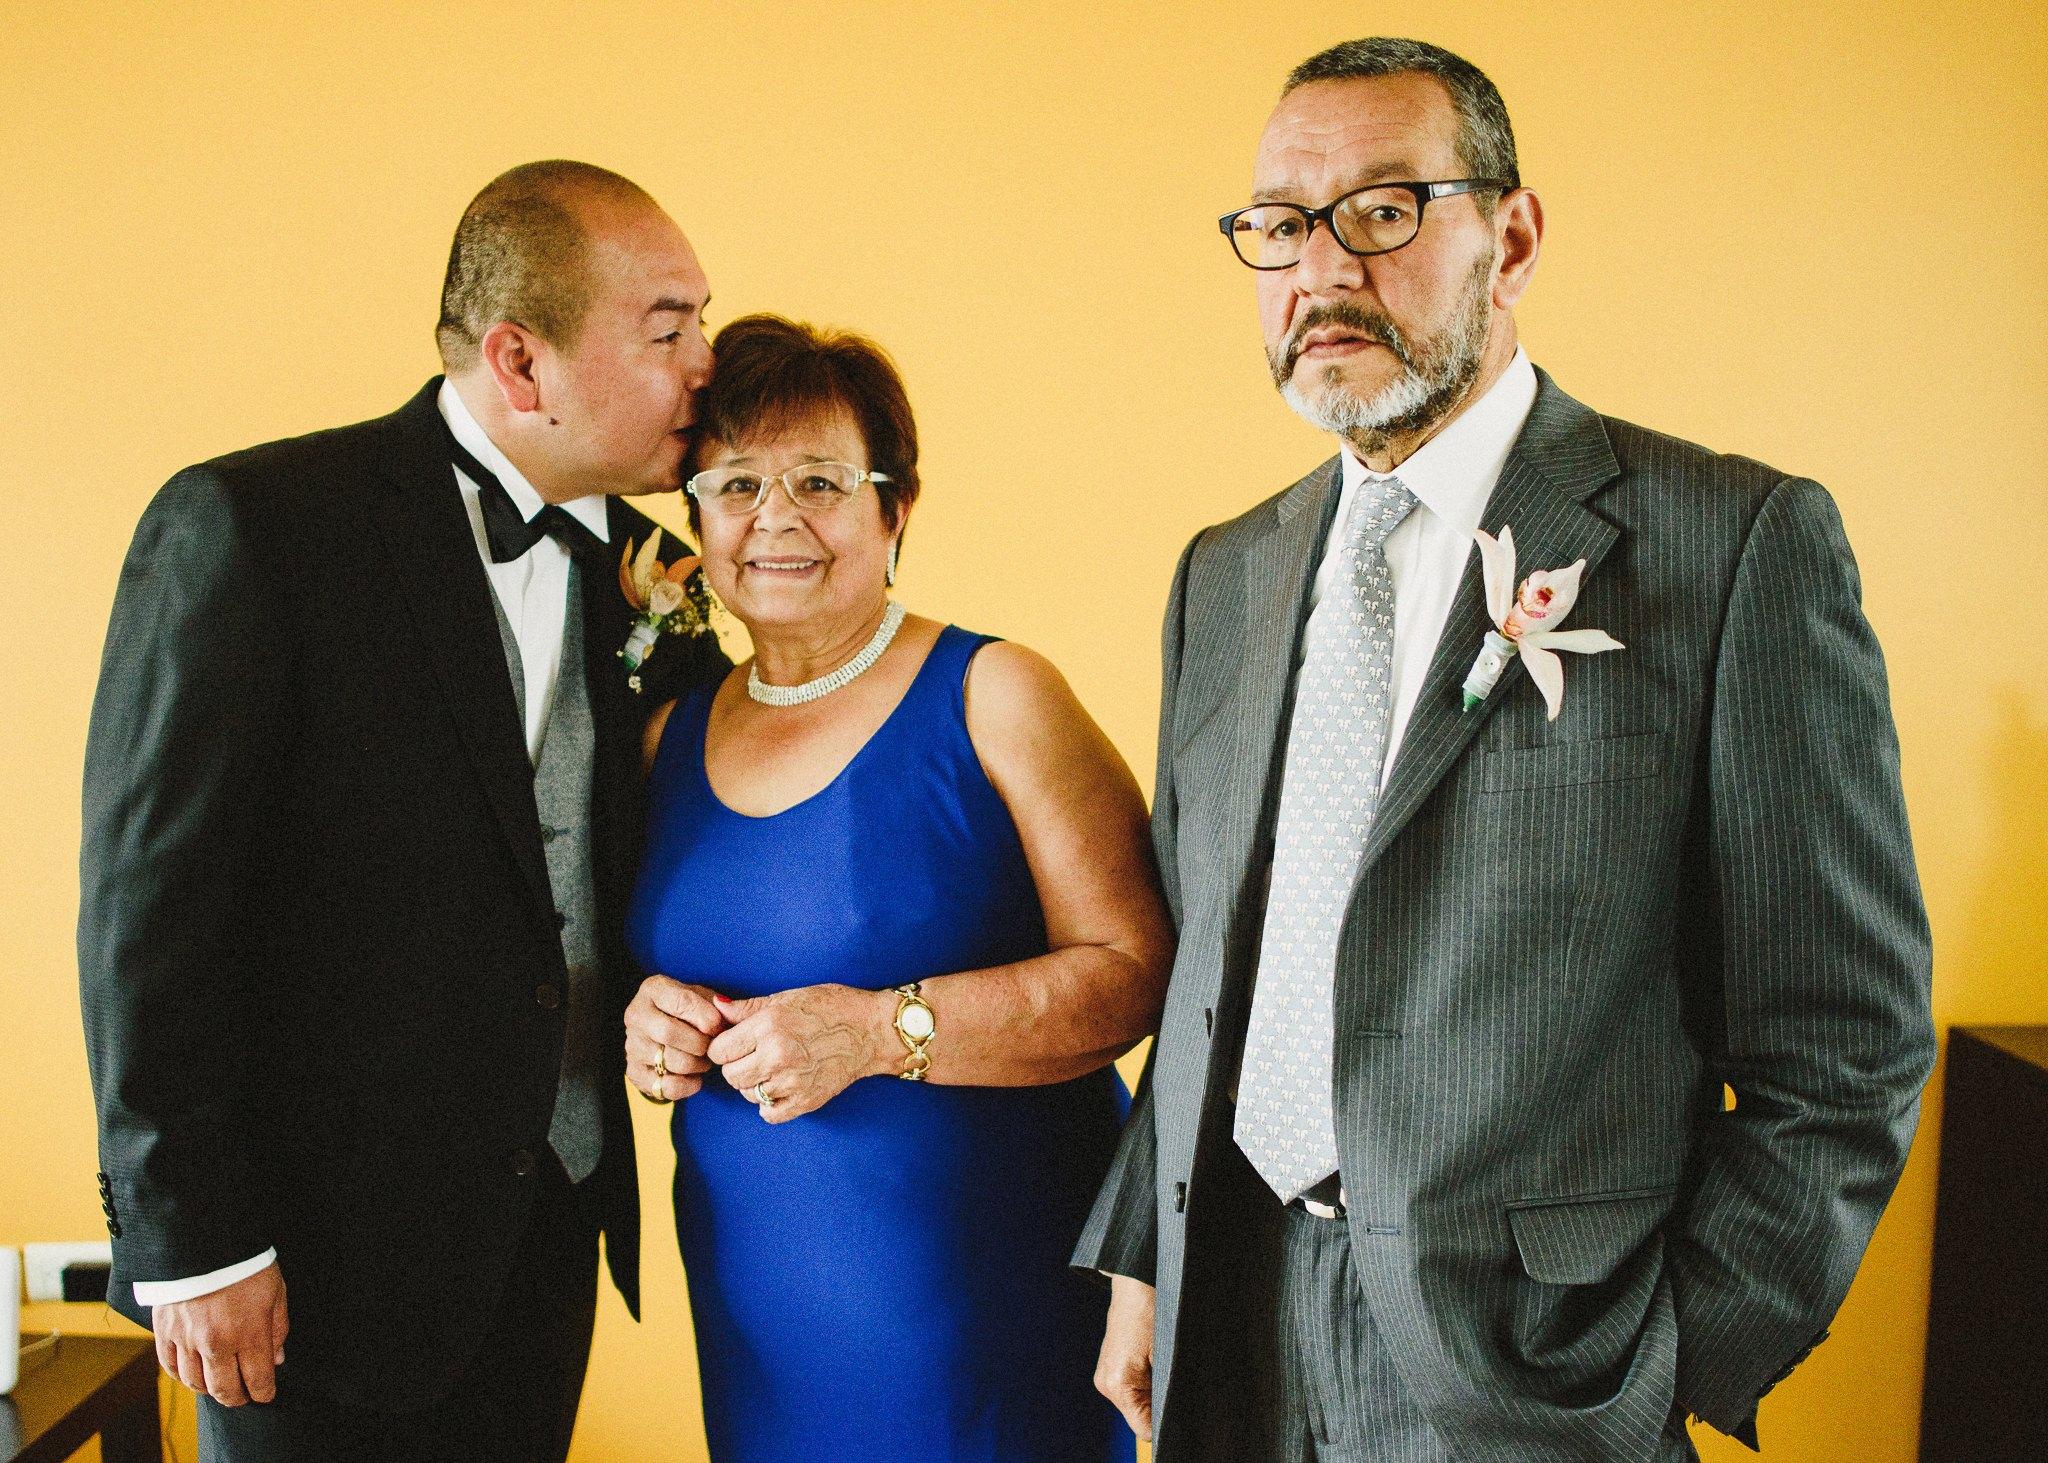 Wedding-Boda-Tulancingo-Hidalgo-Salon-Essenzia-Luis-Houdin-13-film